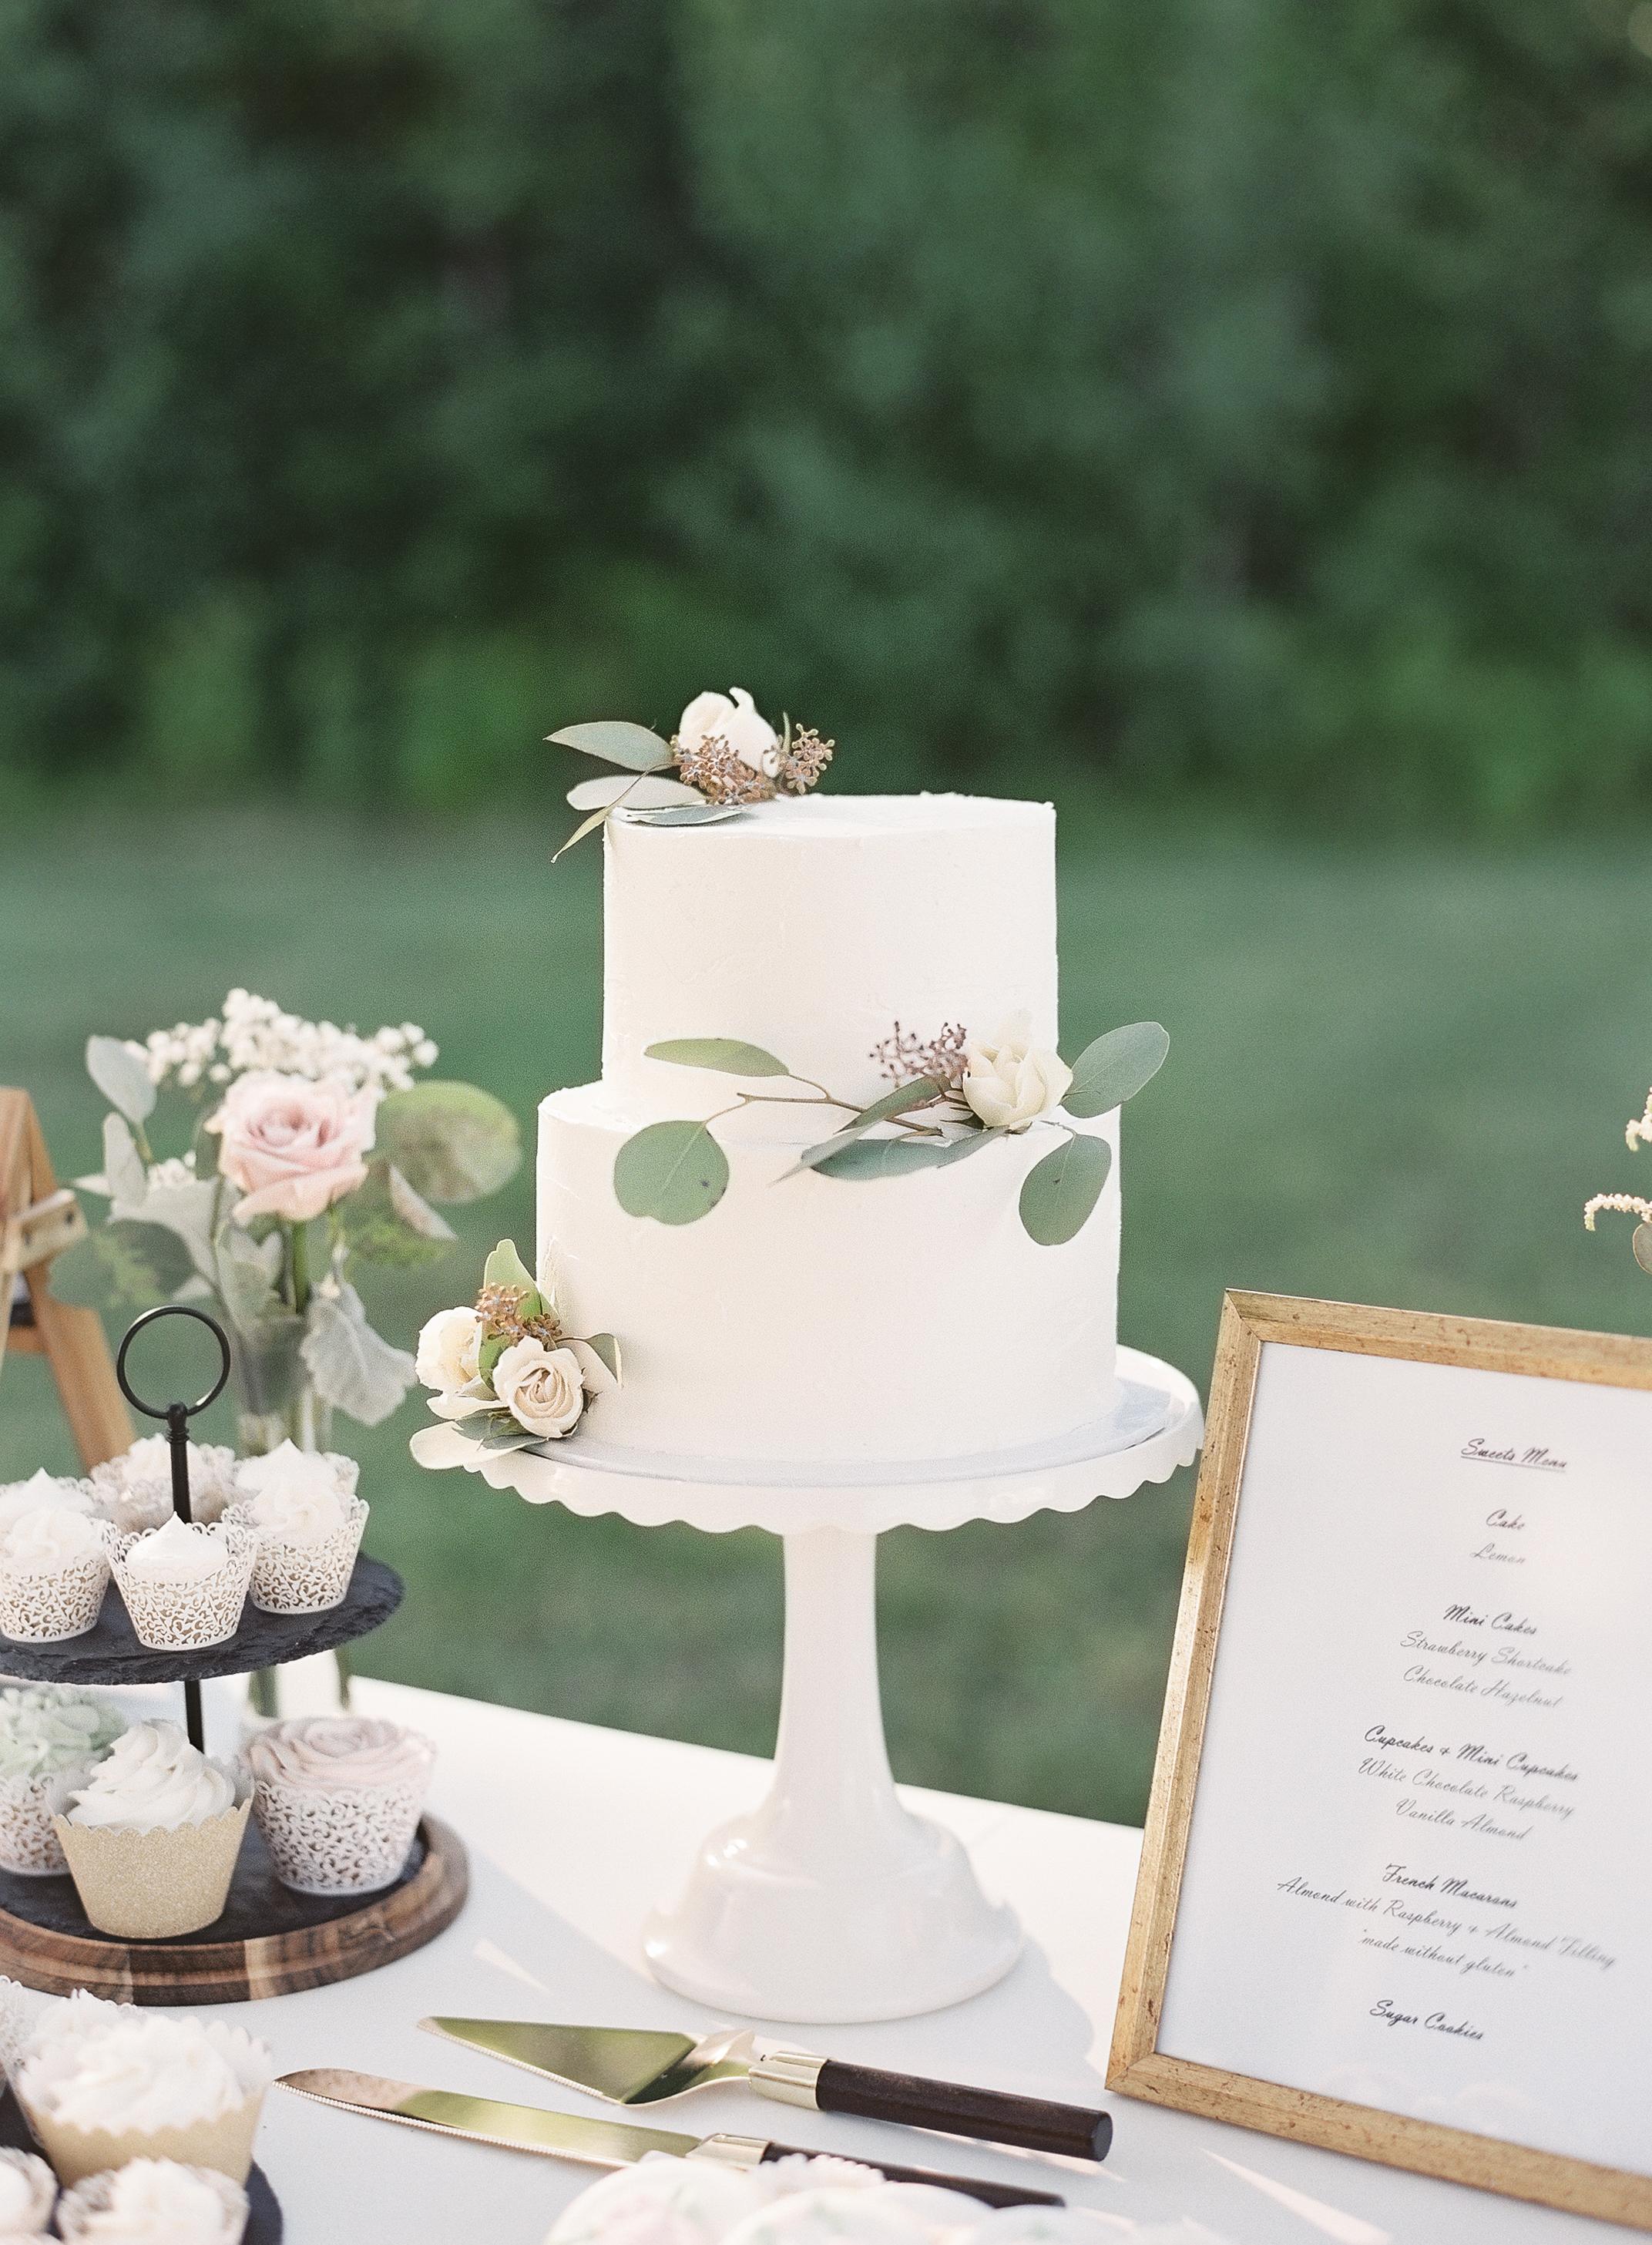 Jacqueline Anne Photography - Cake Babes Wedding Cake-1.jpg